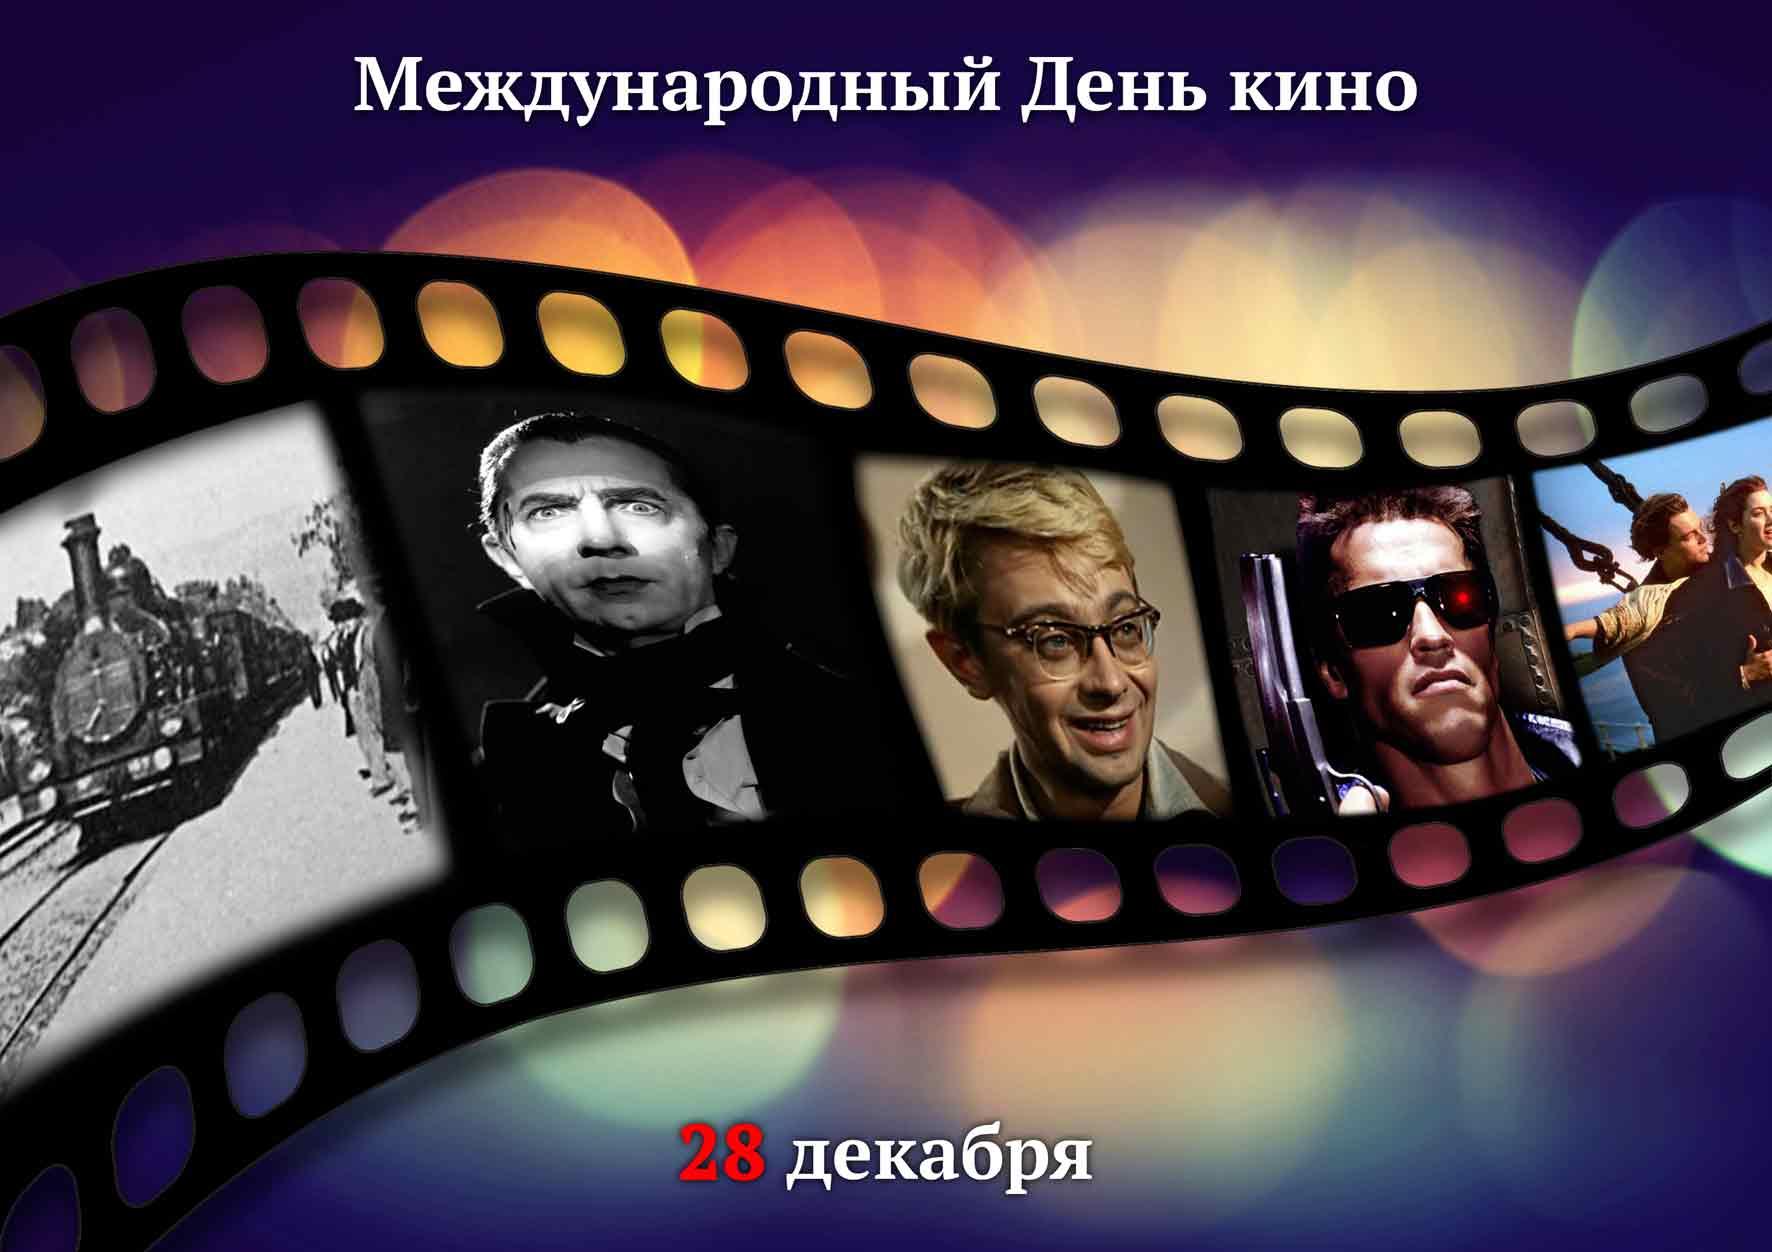 Кино картинки на открытку